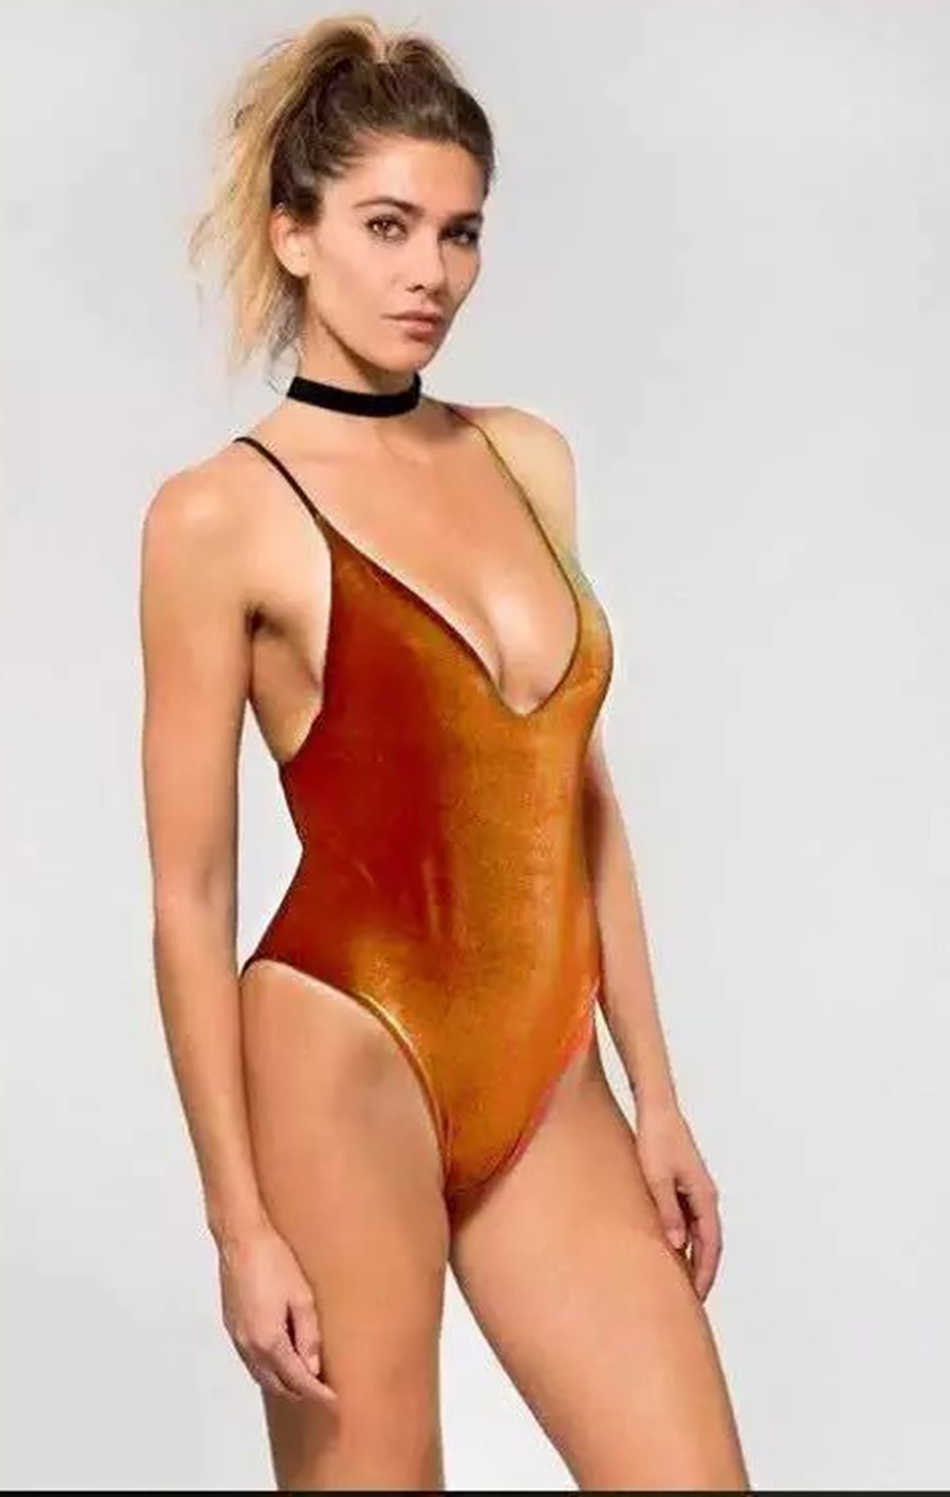 d3983e2e4ec76 ... 2017 Women One Piece Swimwear Trikini Bodysuit Special Material Velvet  Brazilian Sexy Monokini V-NECK ...